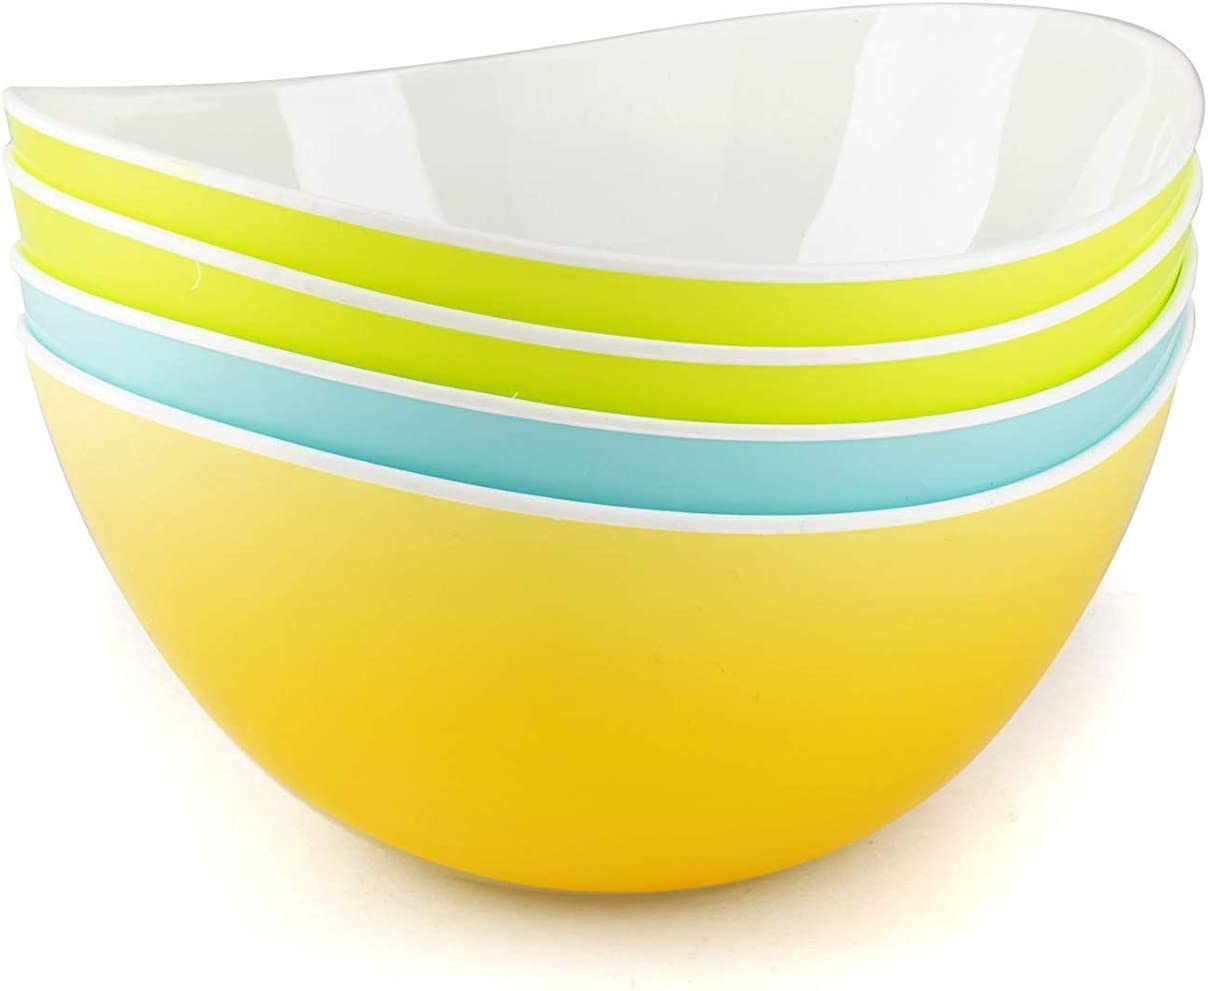 Salad Bowl Plastic Pasta Cereal kids Dessert Serving camping Snacks Mixing Bowls - Set of 4